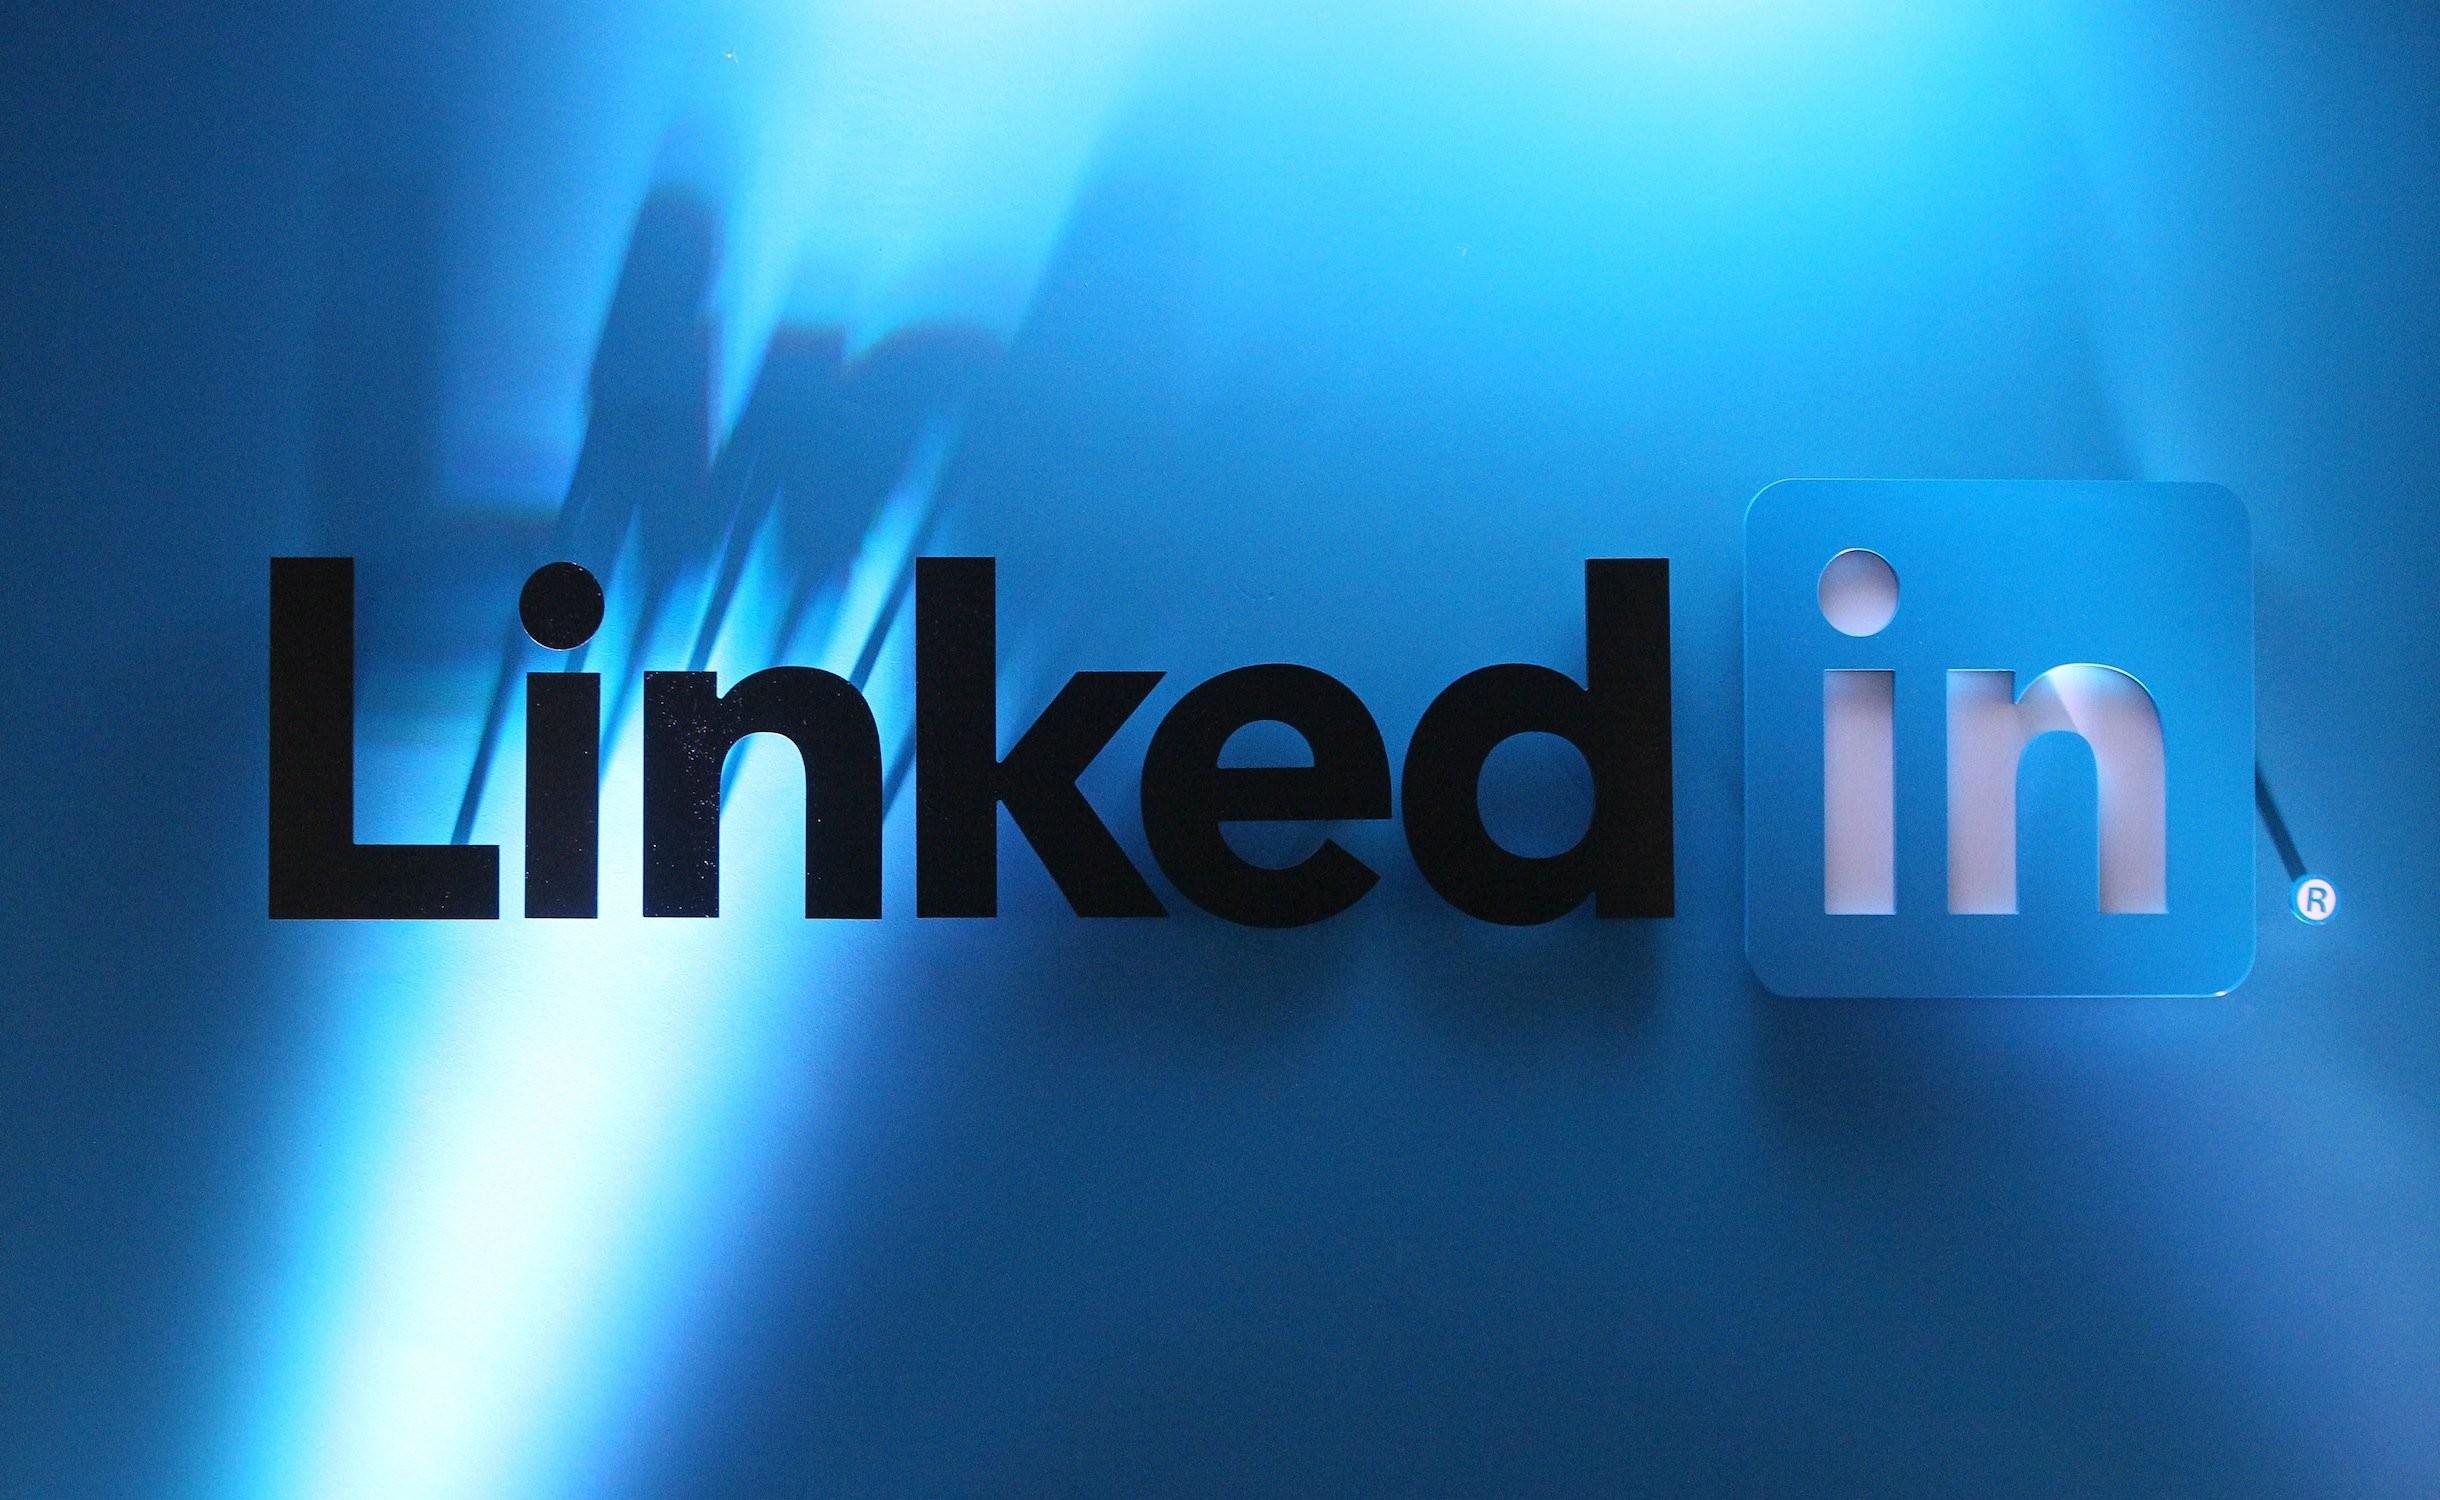 1400x425 Linkedin Wallpaper 64 images